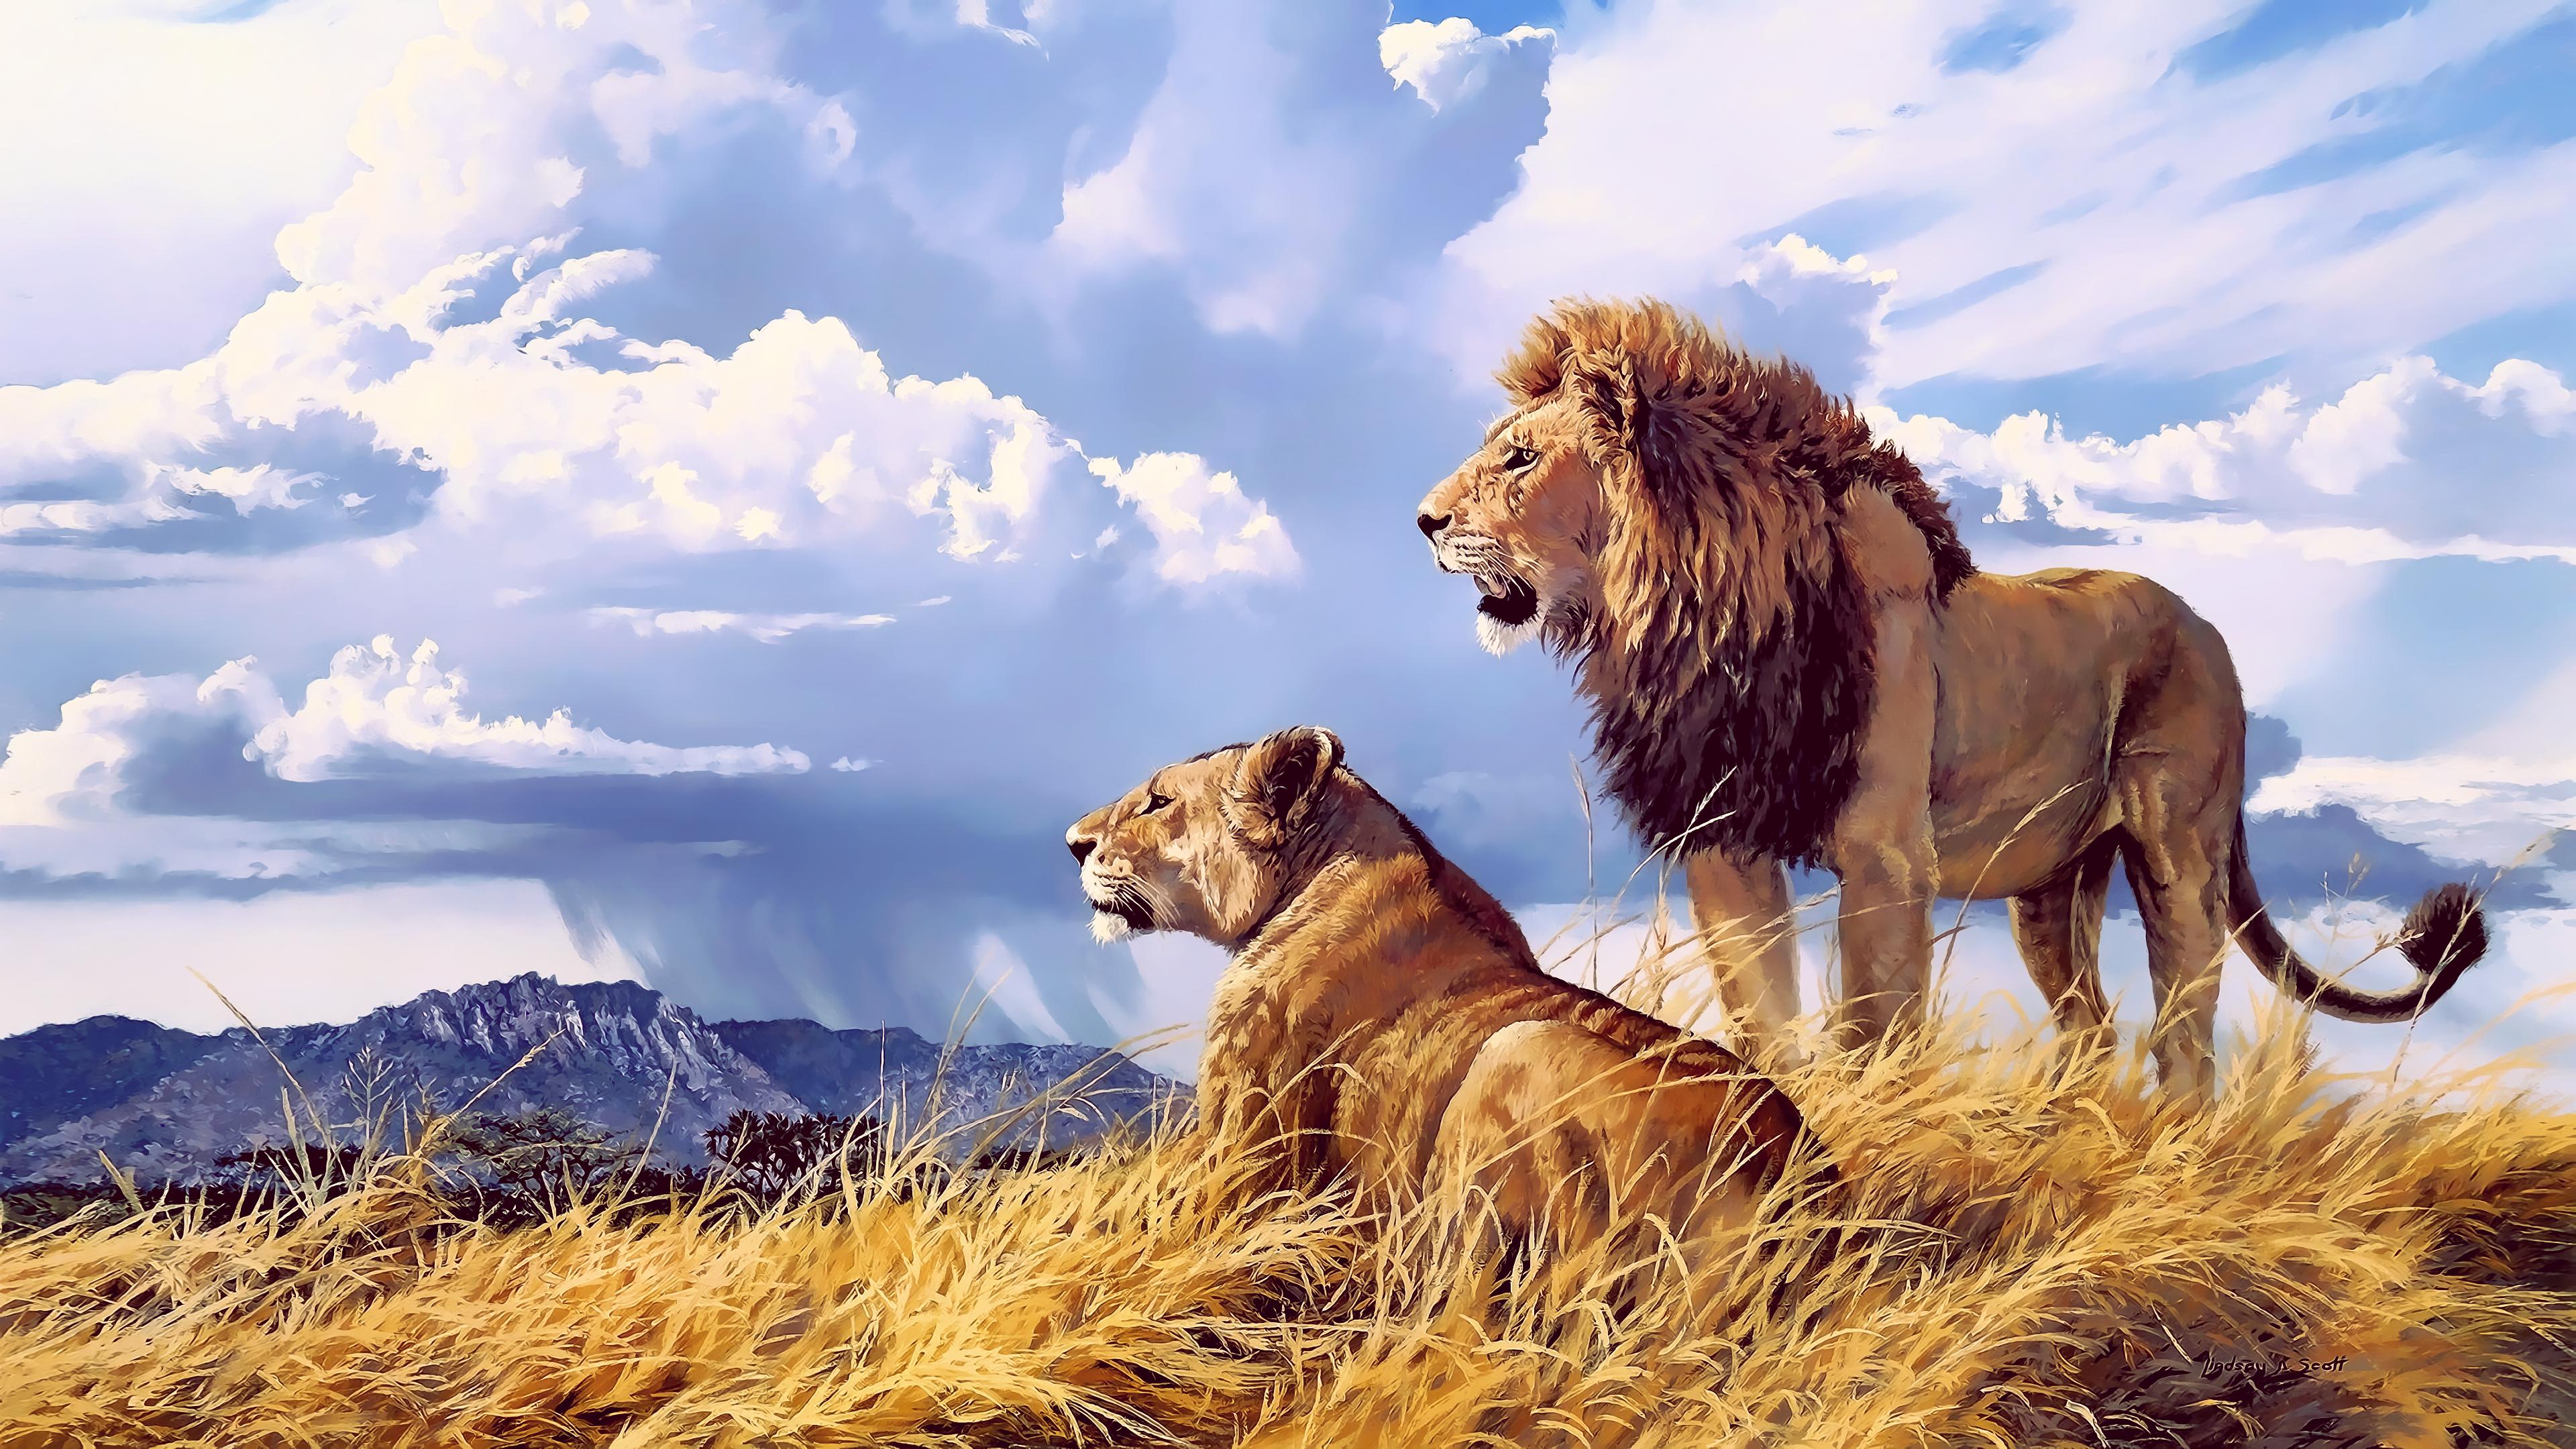 Lion Lioness Artwork 4k Hd Animals 4k Wallpapers Images